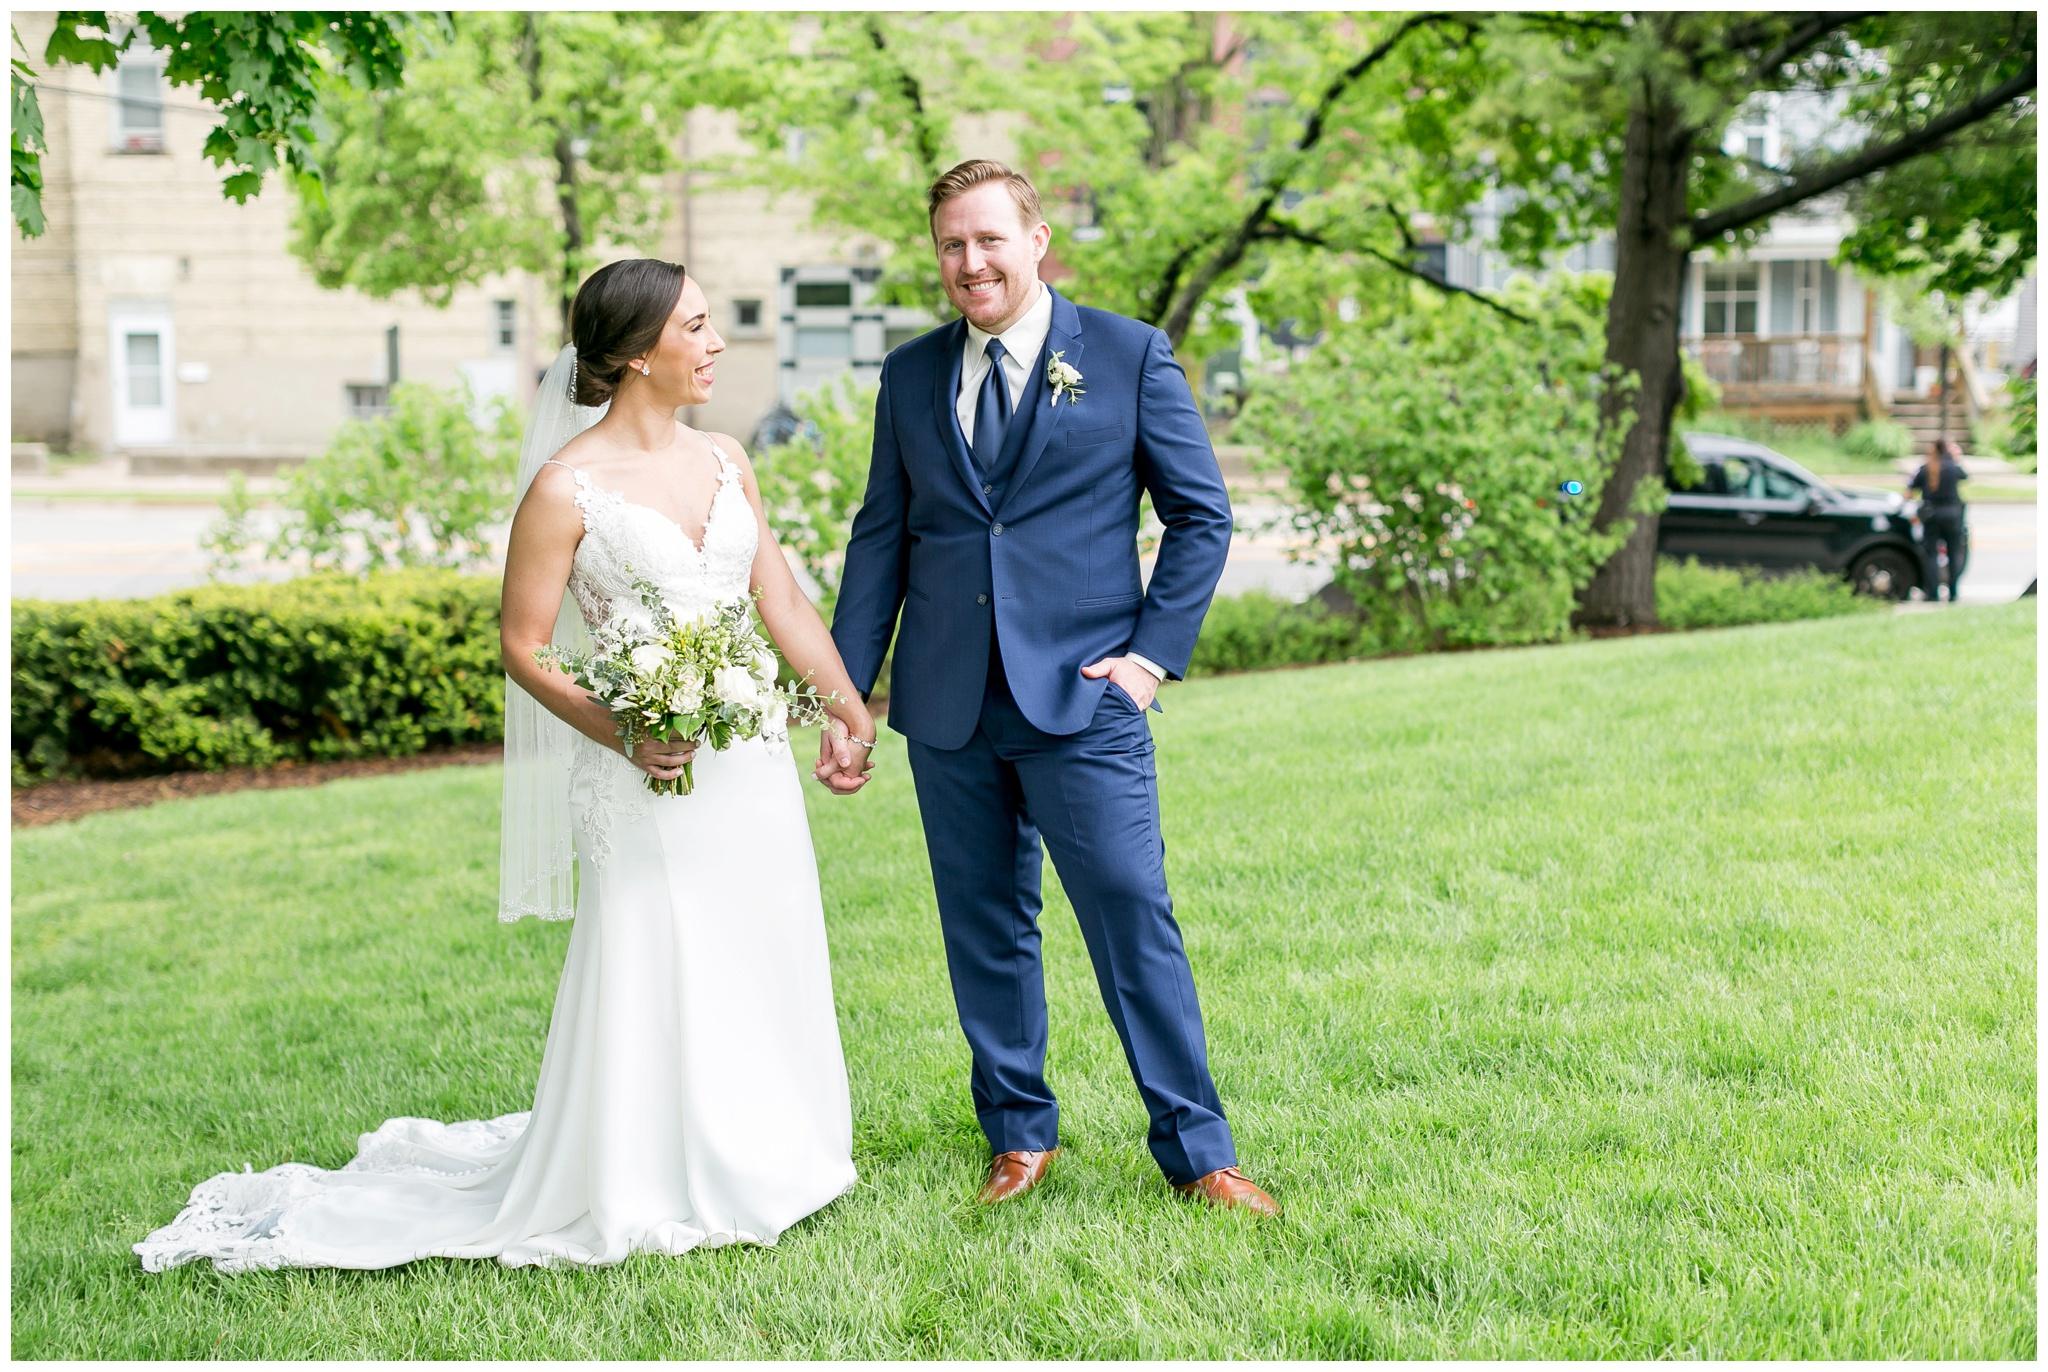 Union_south_Wedding_Madison_Wisconsin_Caynay_Photo_3655.jpg